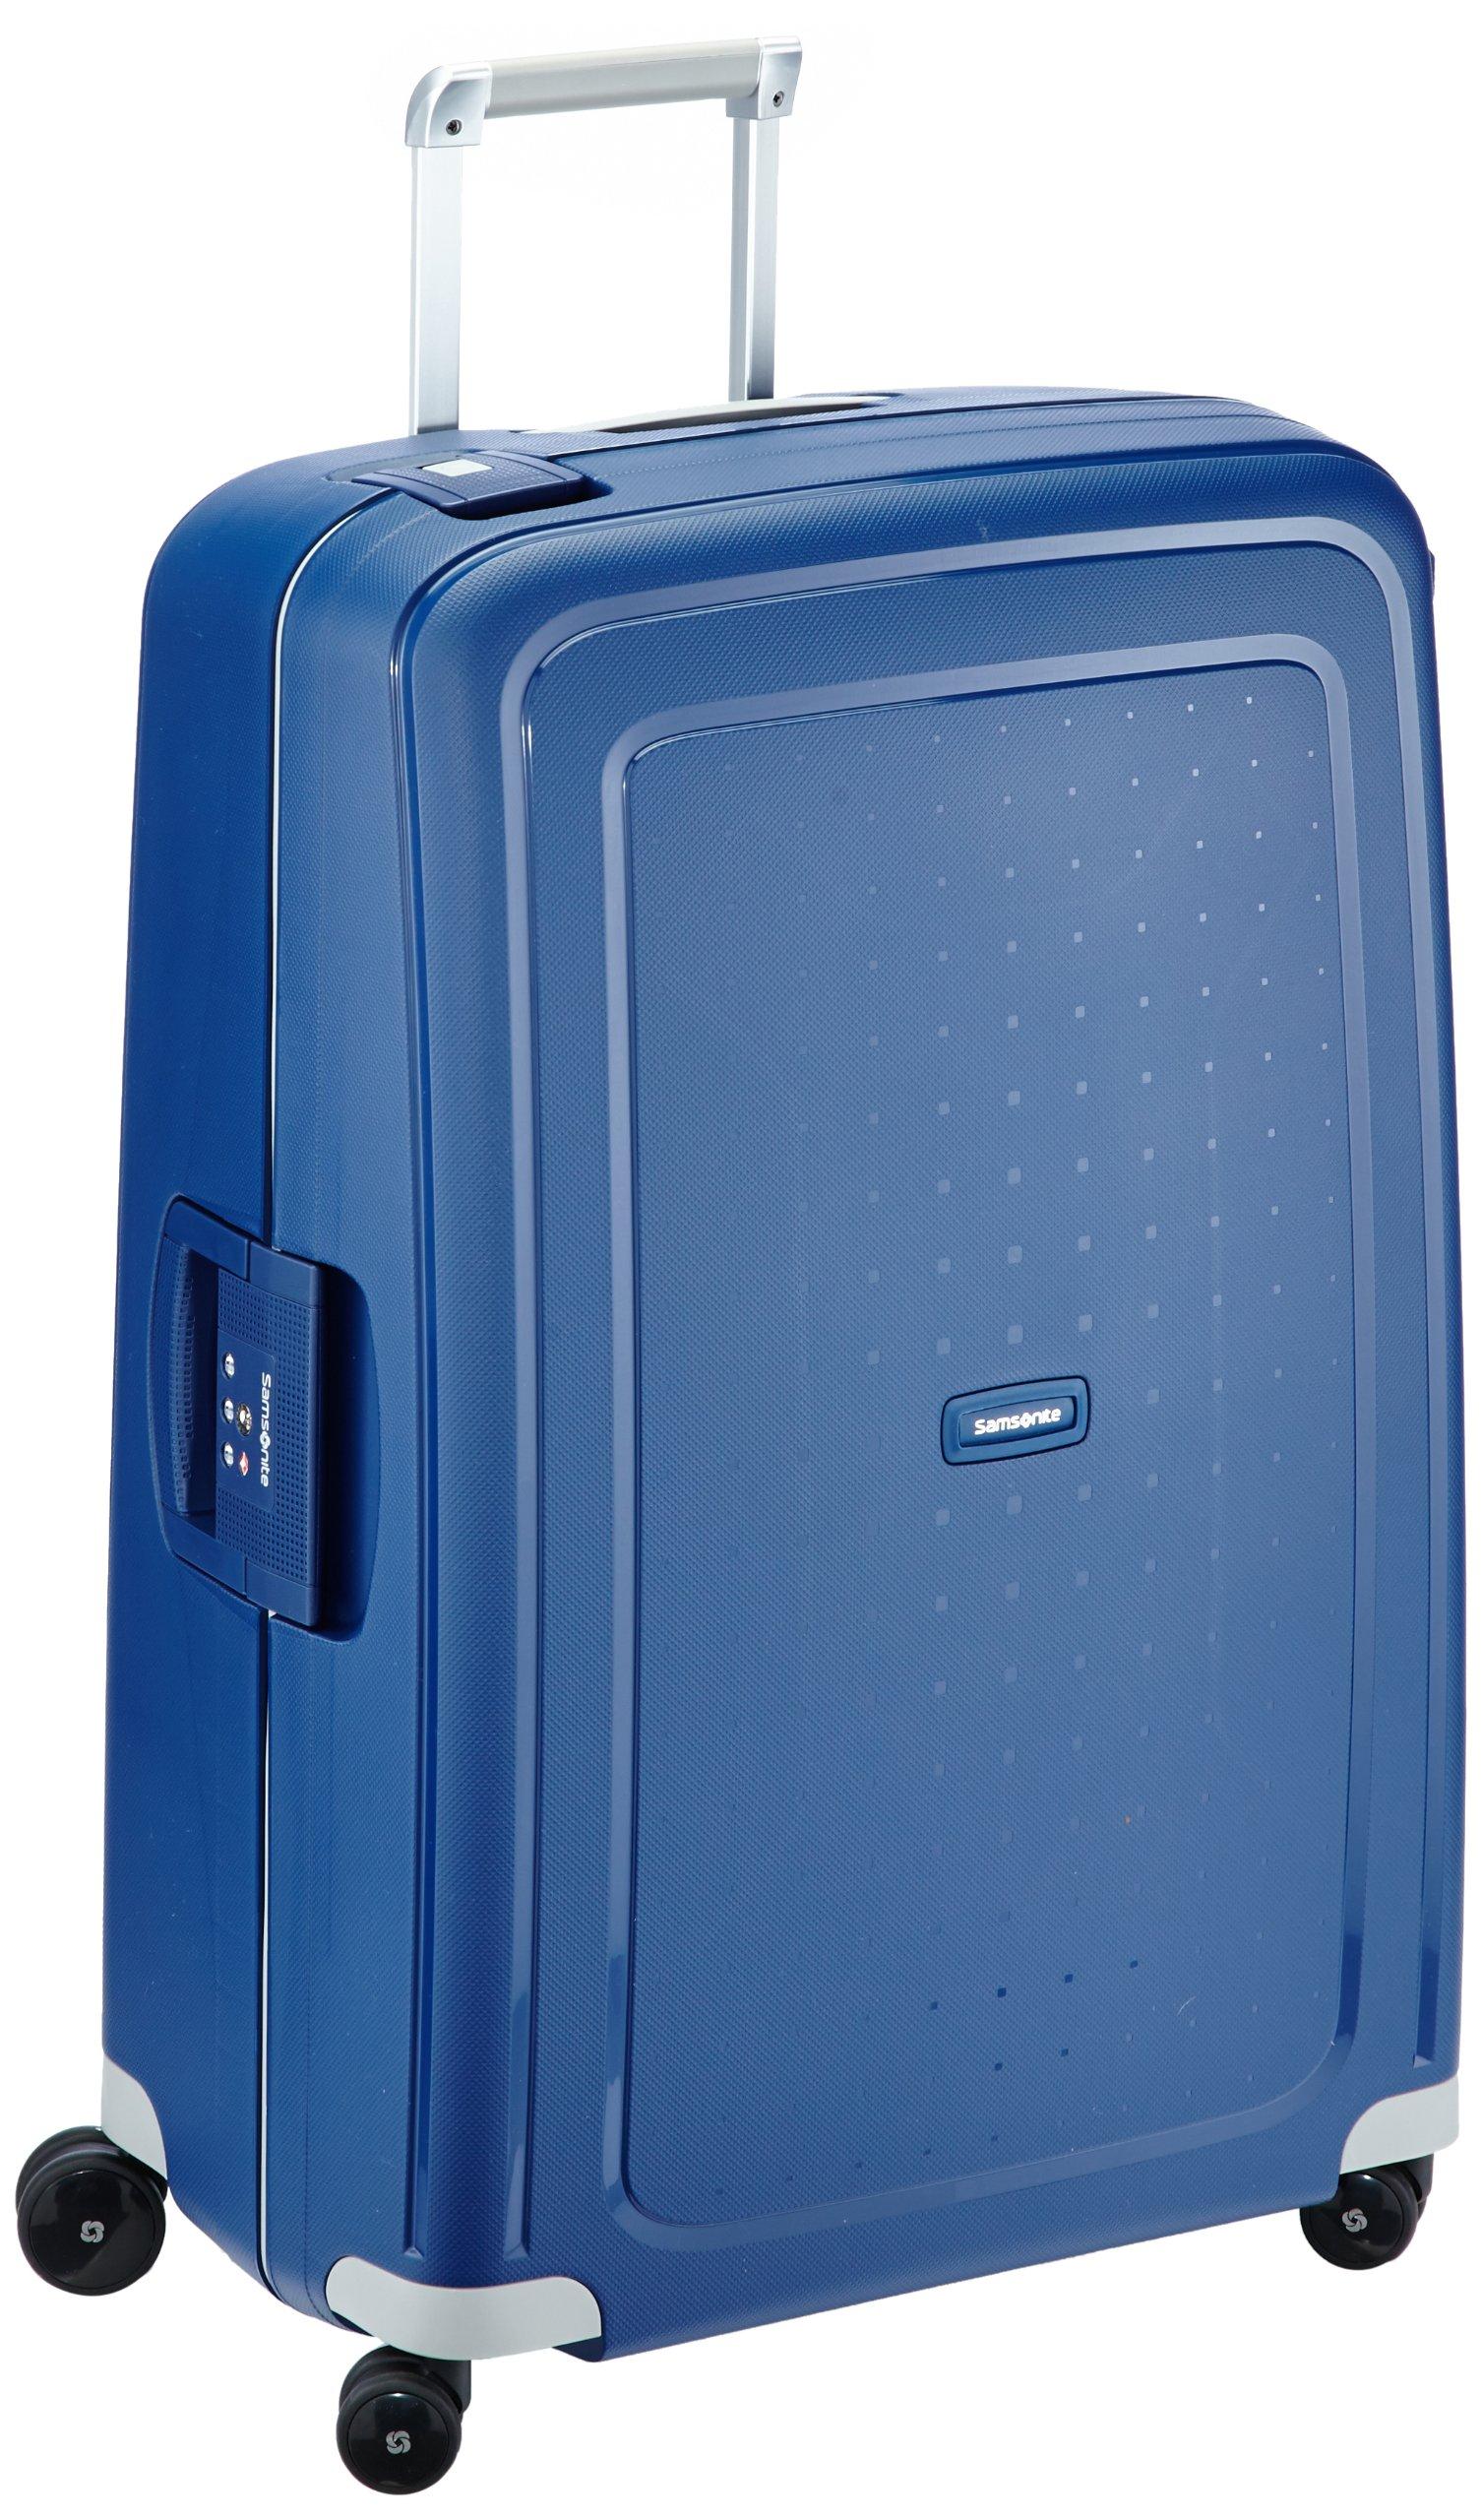 Samsonite S'Cure - Spinner 75 - 4,60 Kg Valise, 75 cm, 102 L, Bleu (Dark Blue) product image